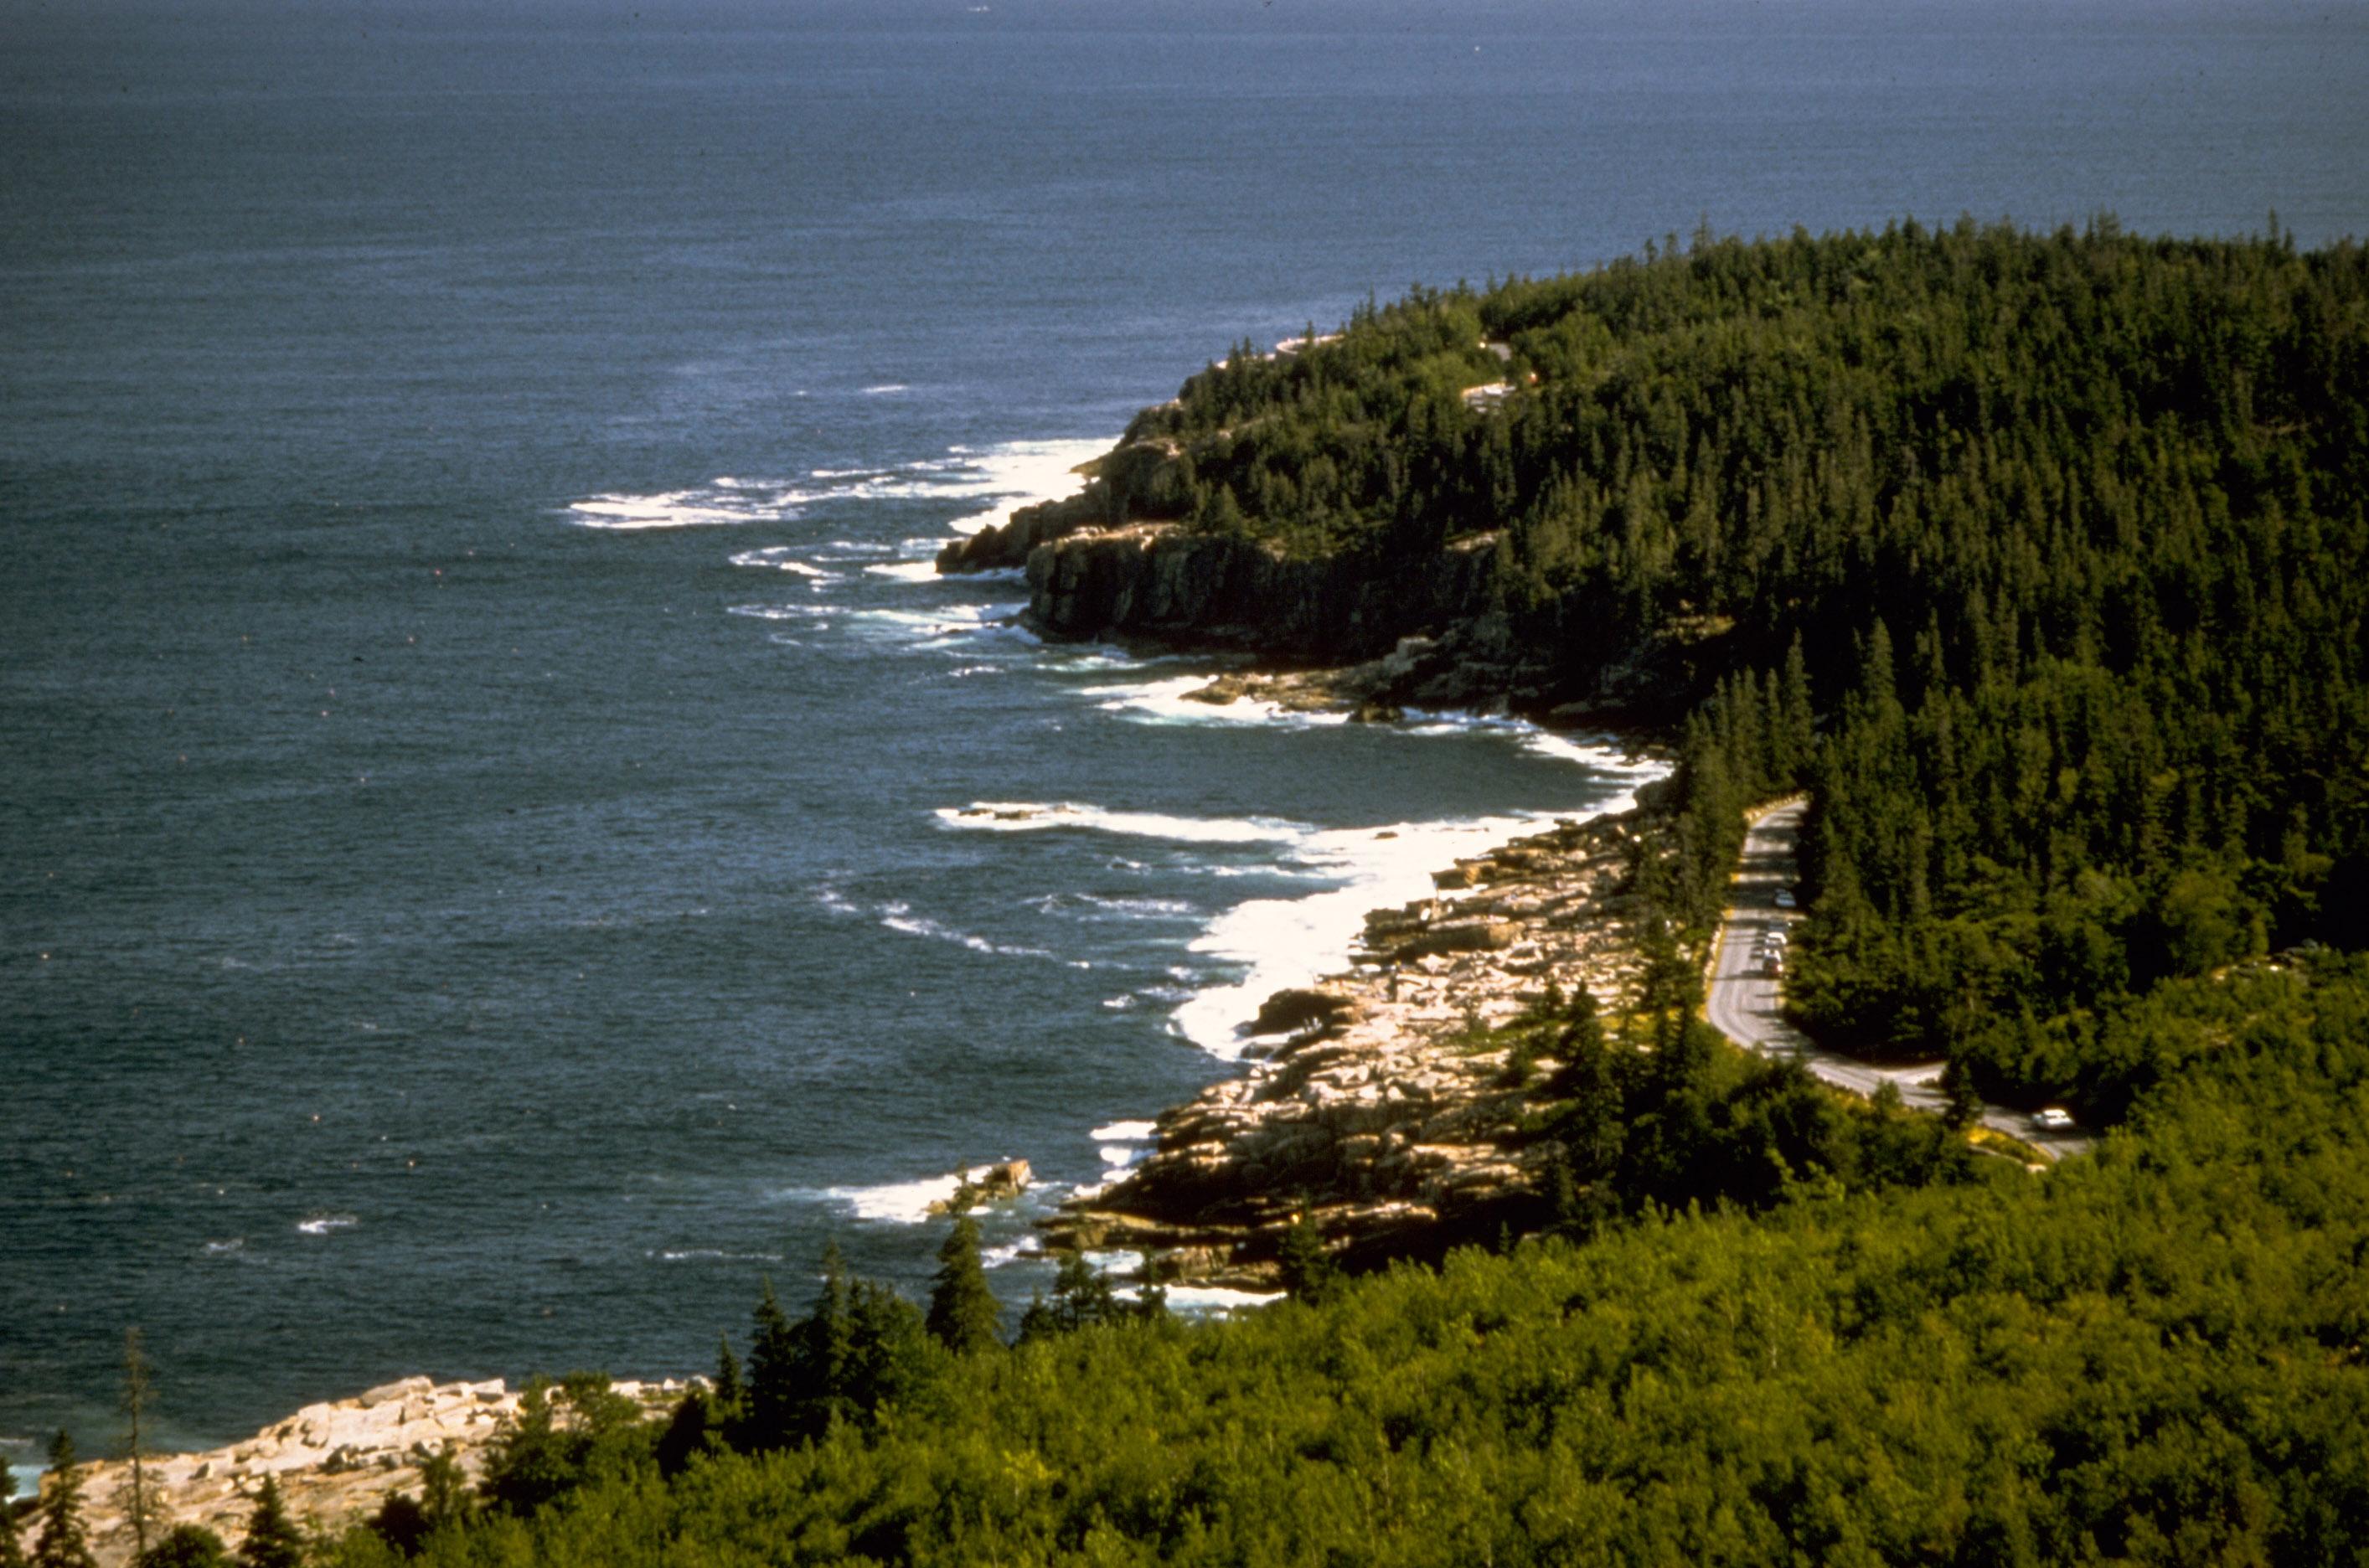 Harvard hgse computer tables flickr photo sharing - Shoreline Landscape At Acadia National Park Maine Photo By Nps Public Domain From Https Www Goodfreephotos Com